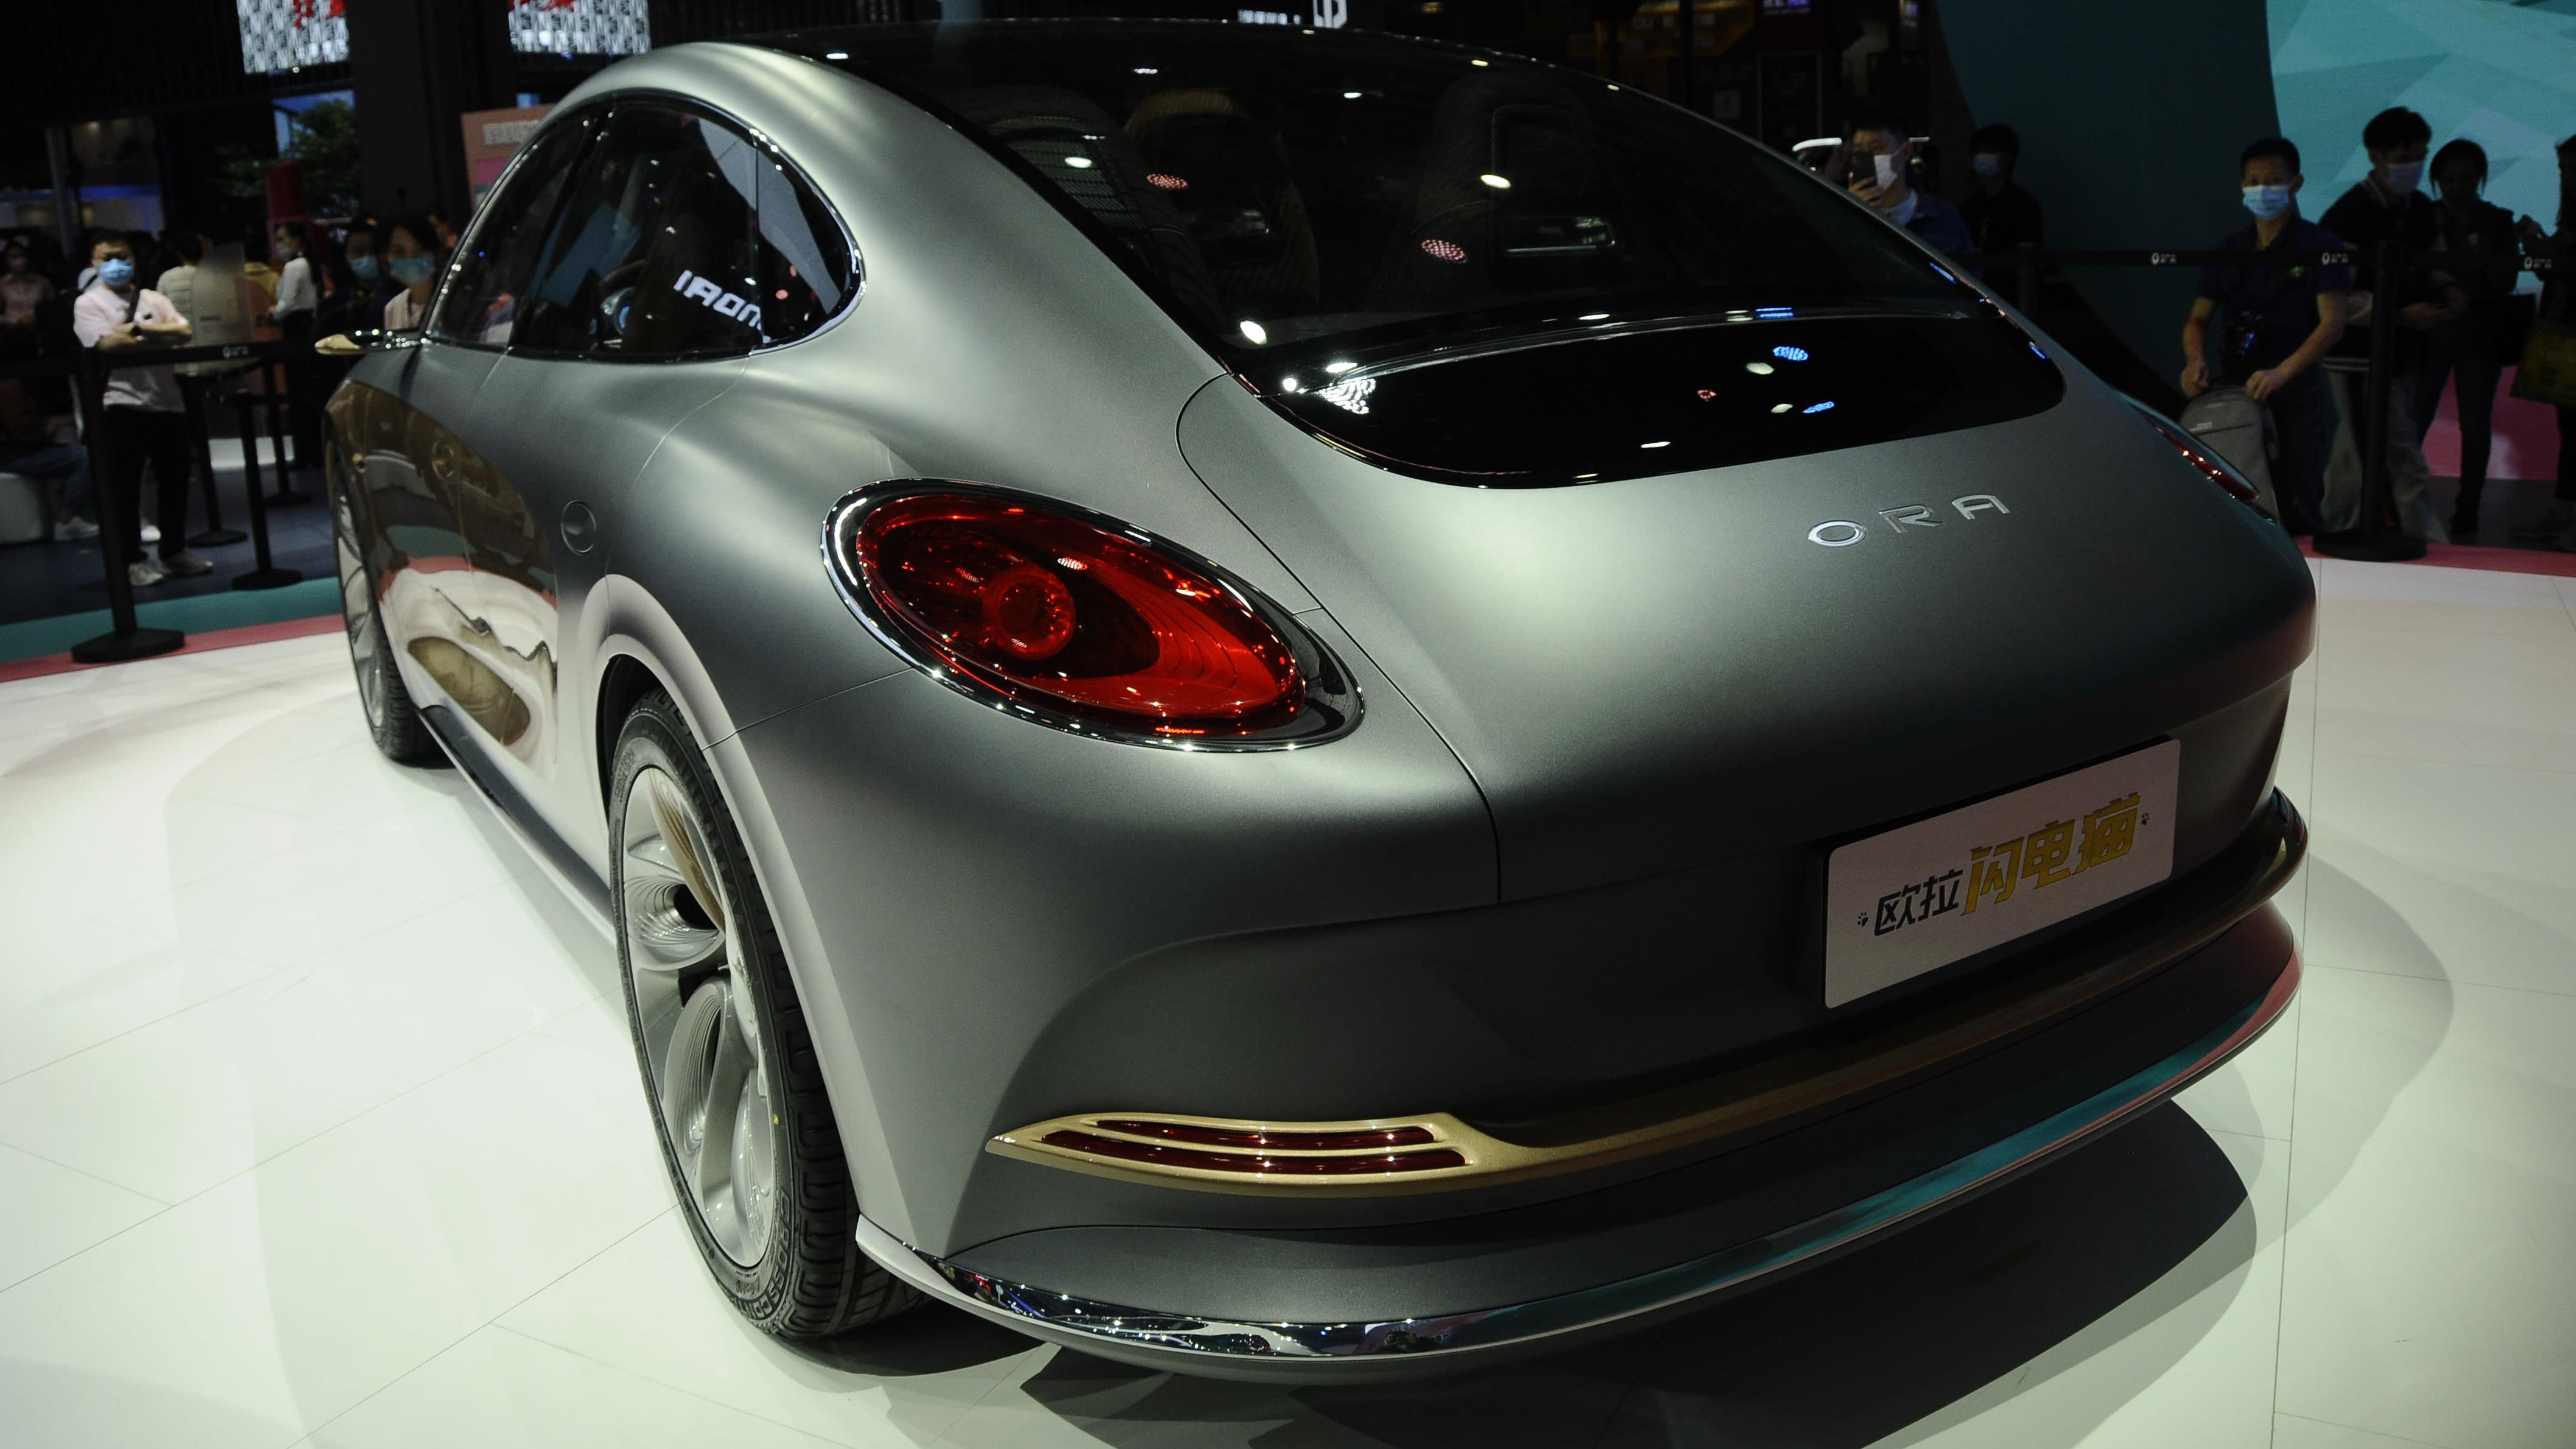 Ora Lightning Cat Concept car front exterior